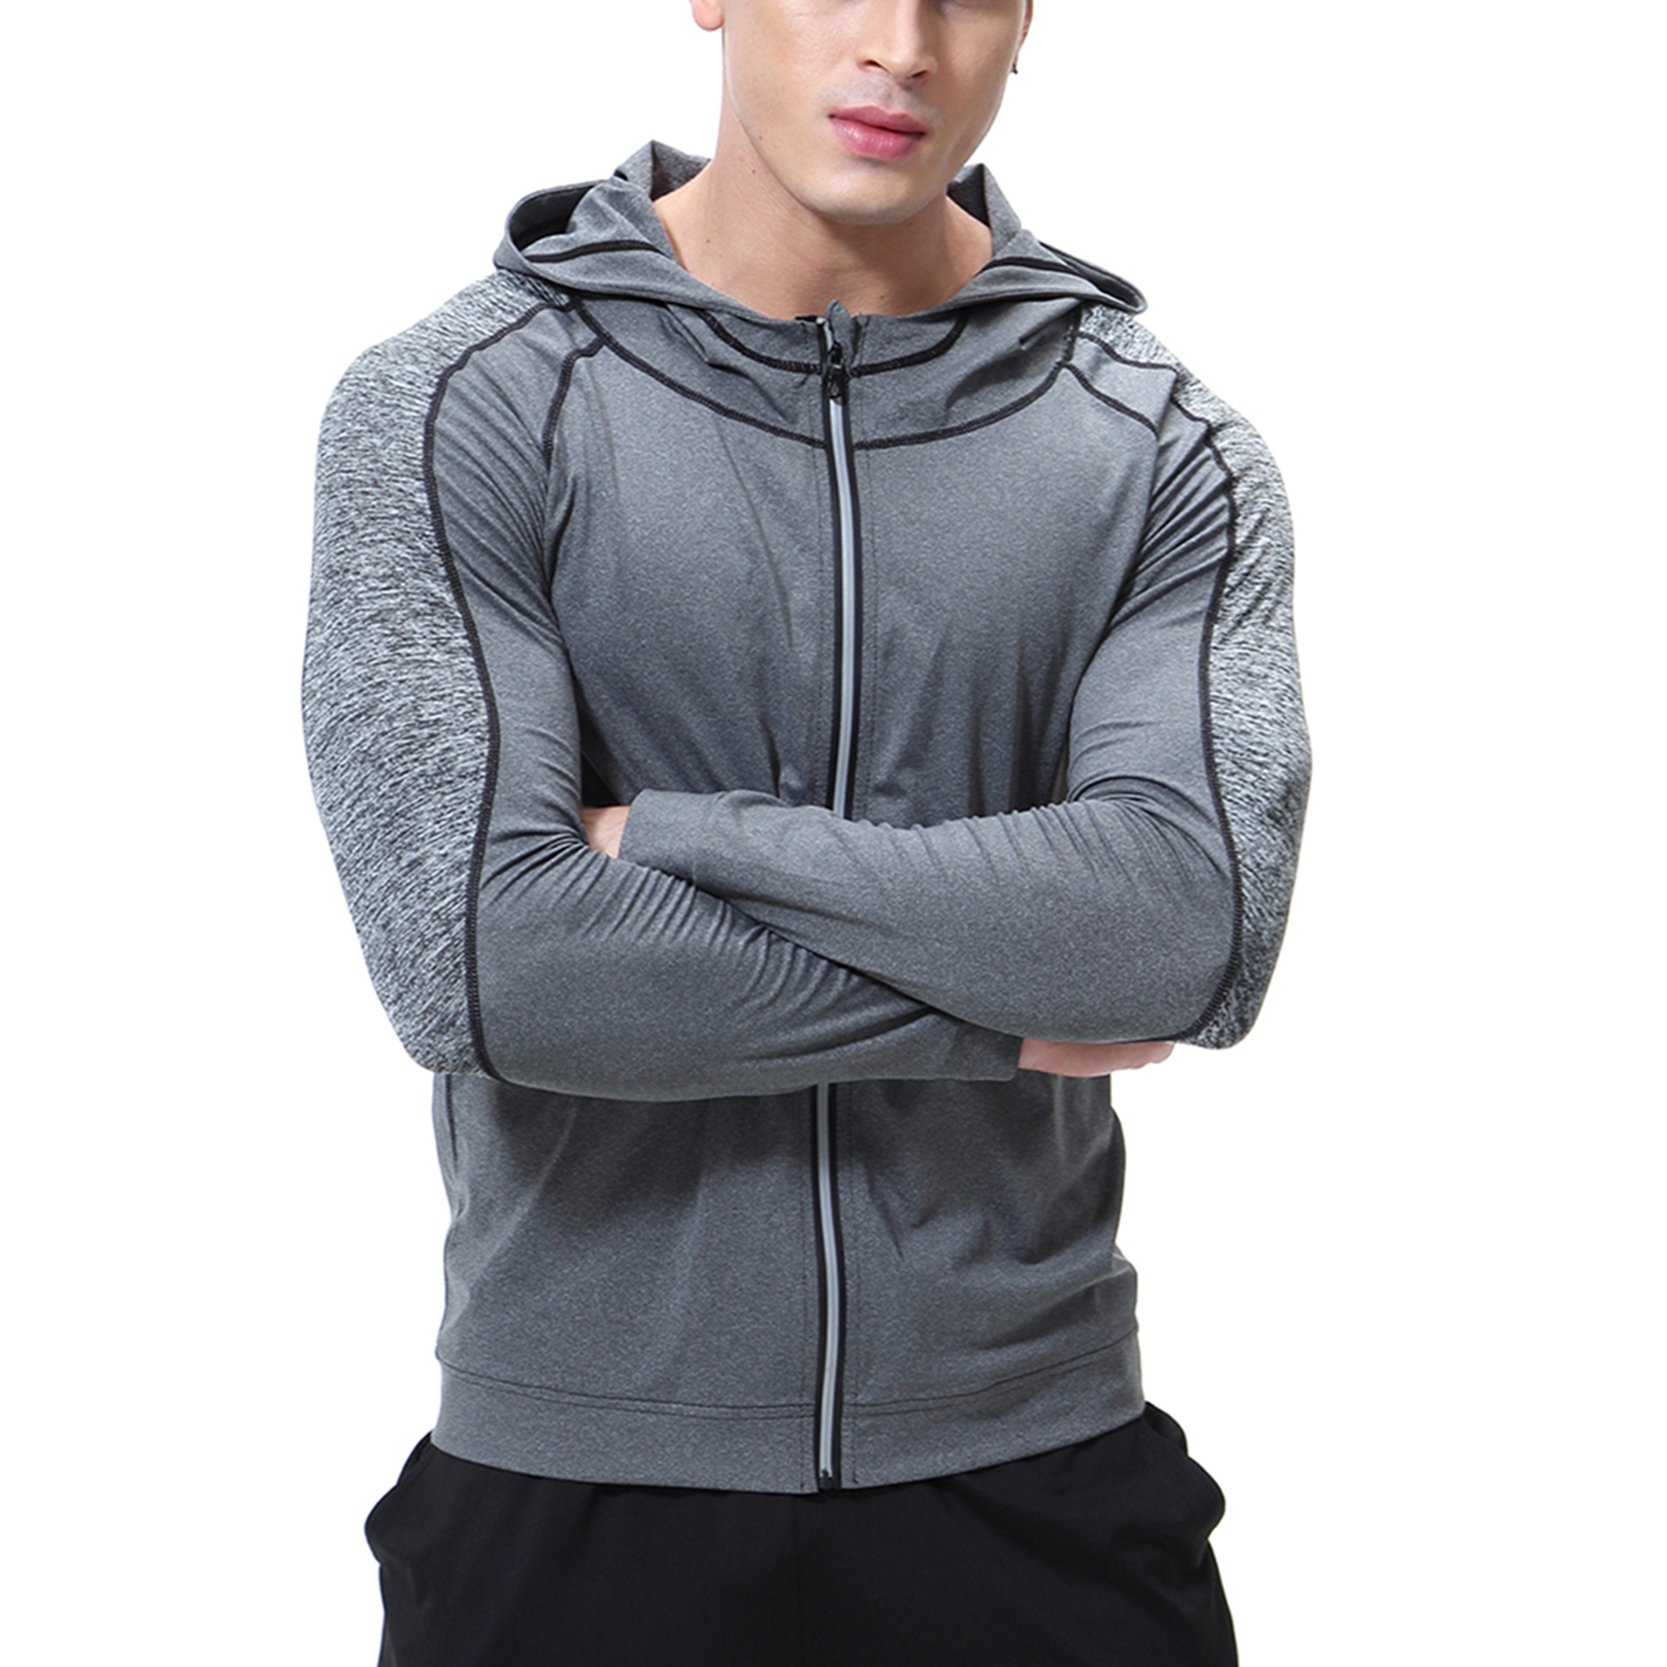 SEVENWELL Men's Zip-up Hoodie Warm Hooded Sweatshirt Coat Jacket Outwear Sweater Gray XL= US L